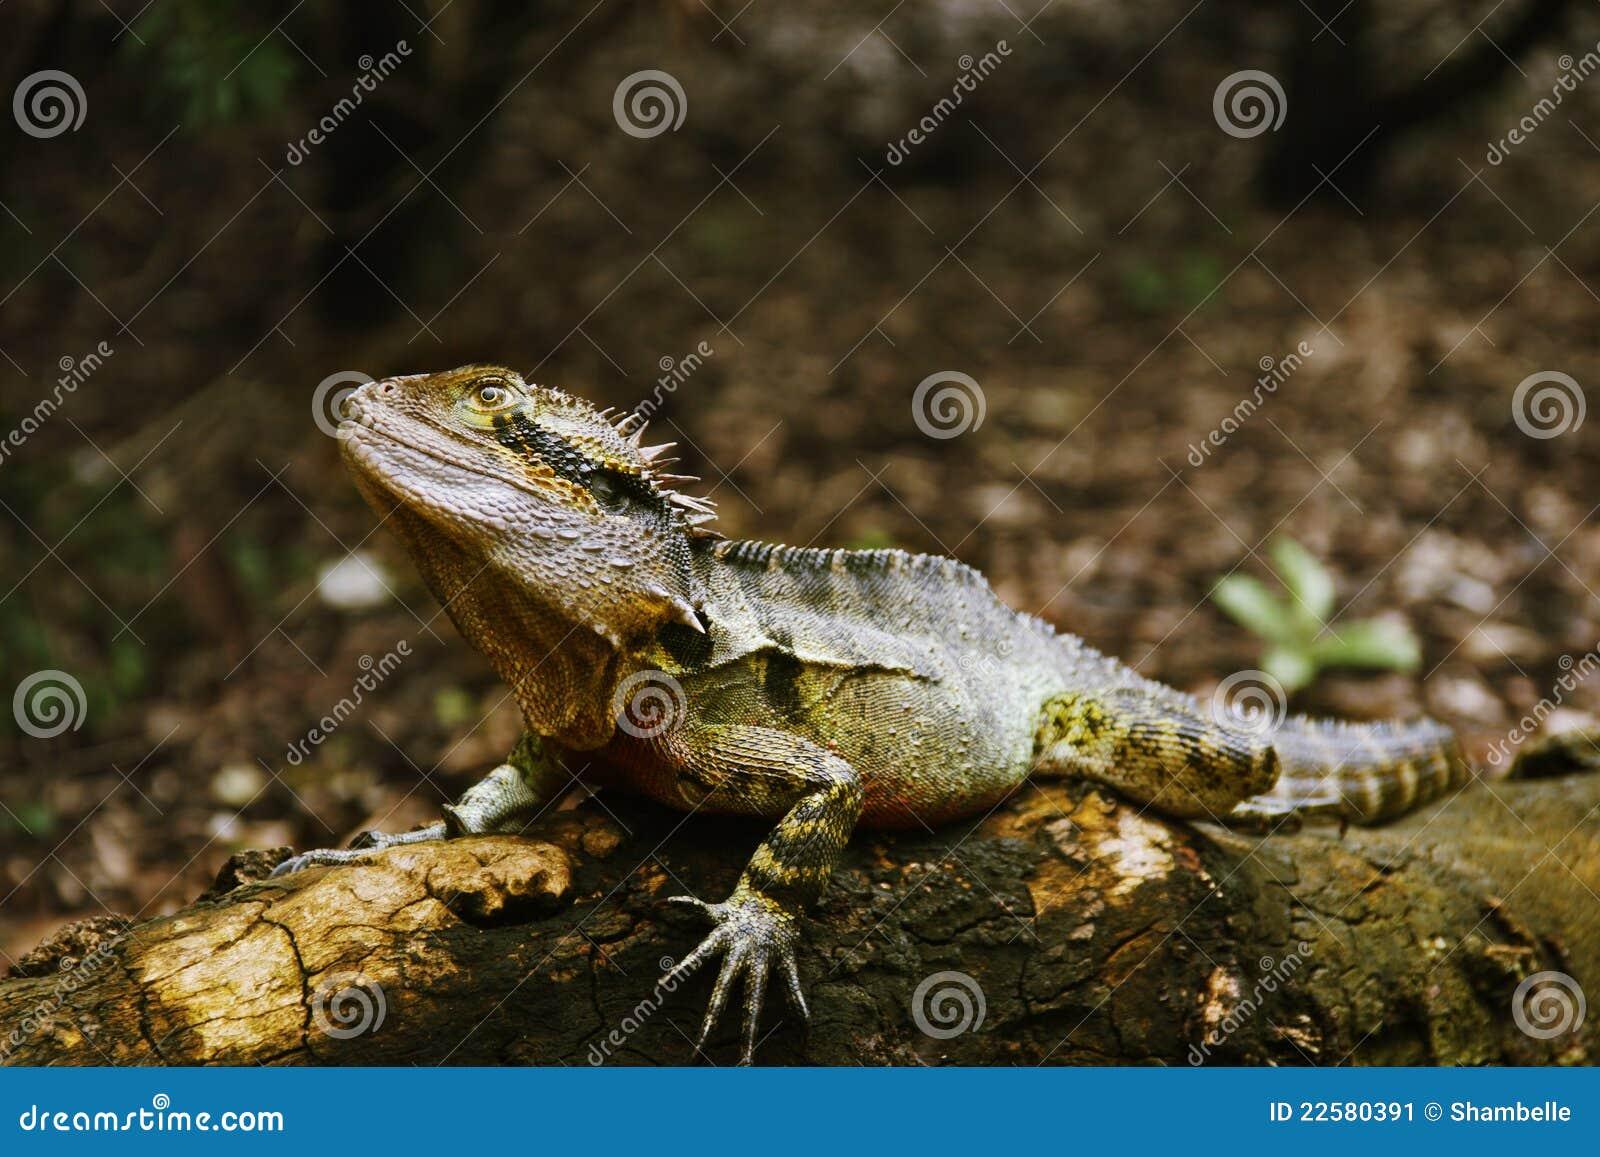 Australian Water Dragon Lizard: Australian Lizard Stock Image